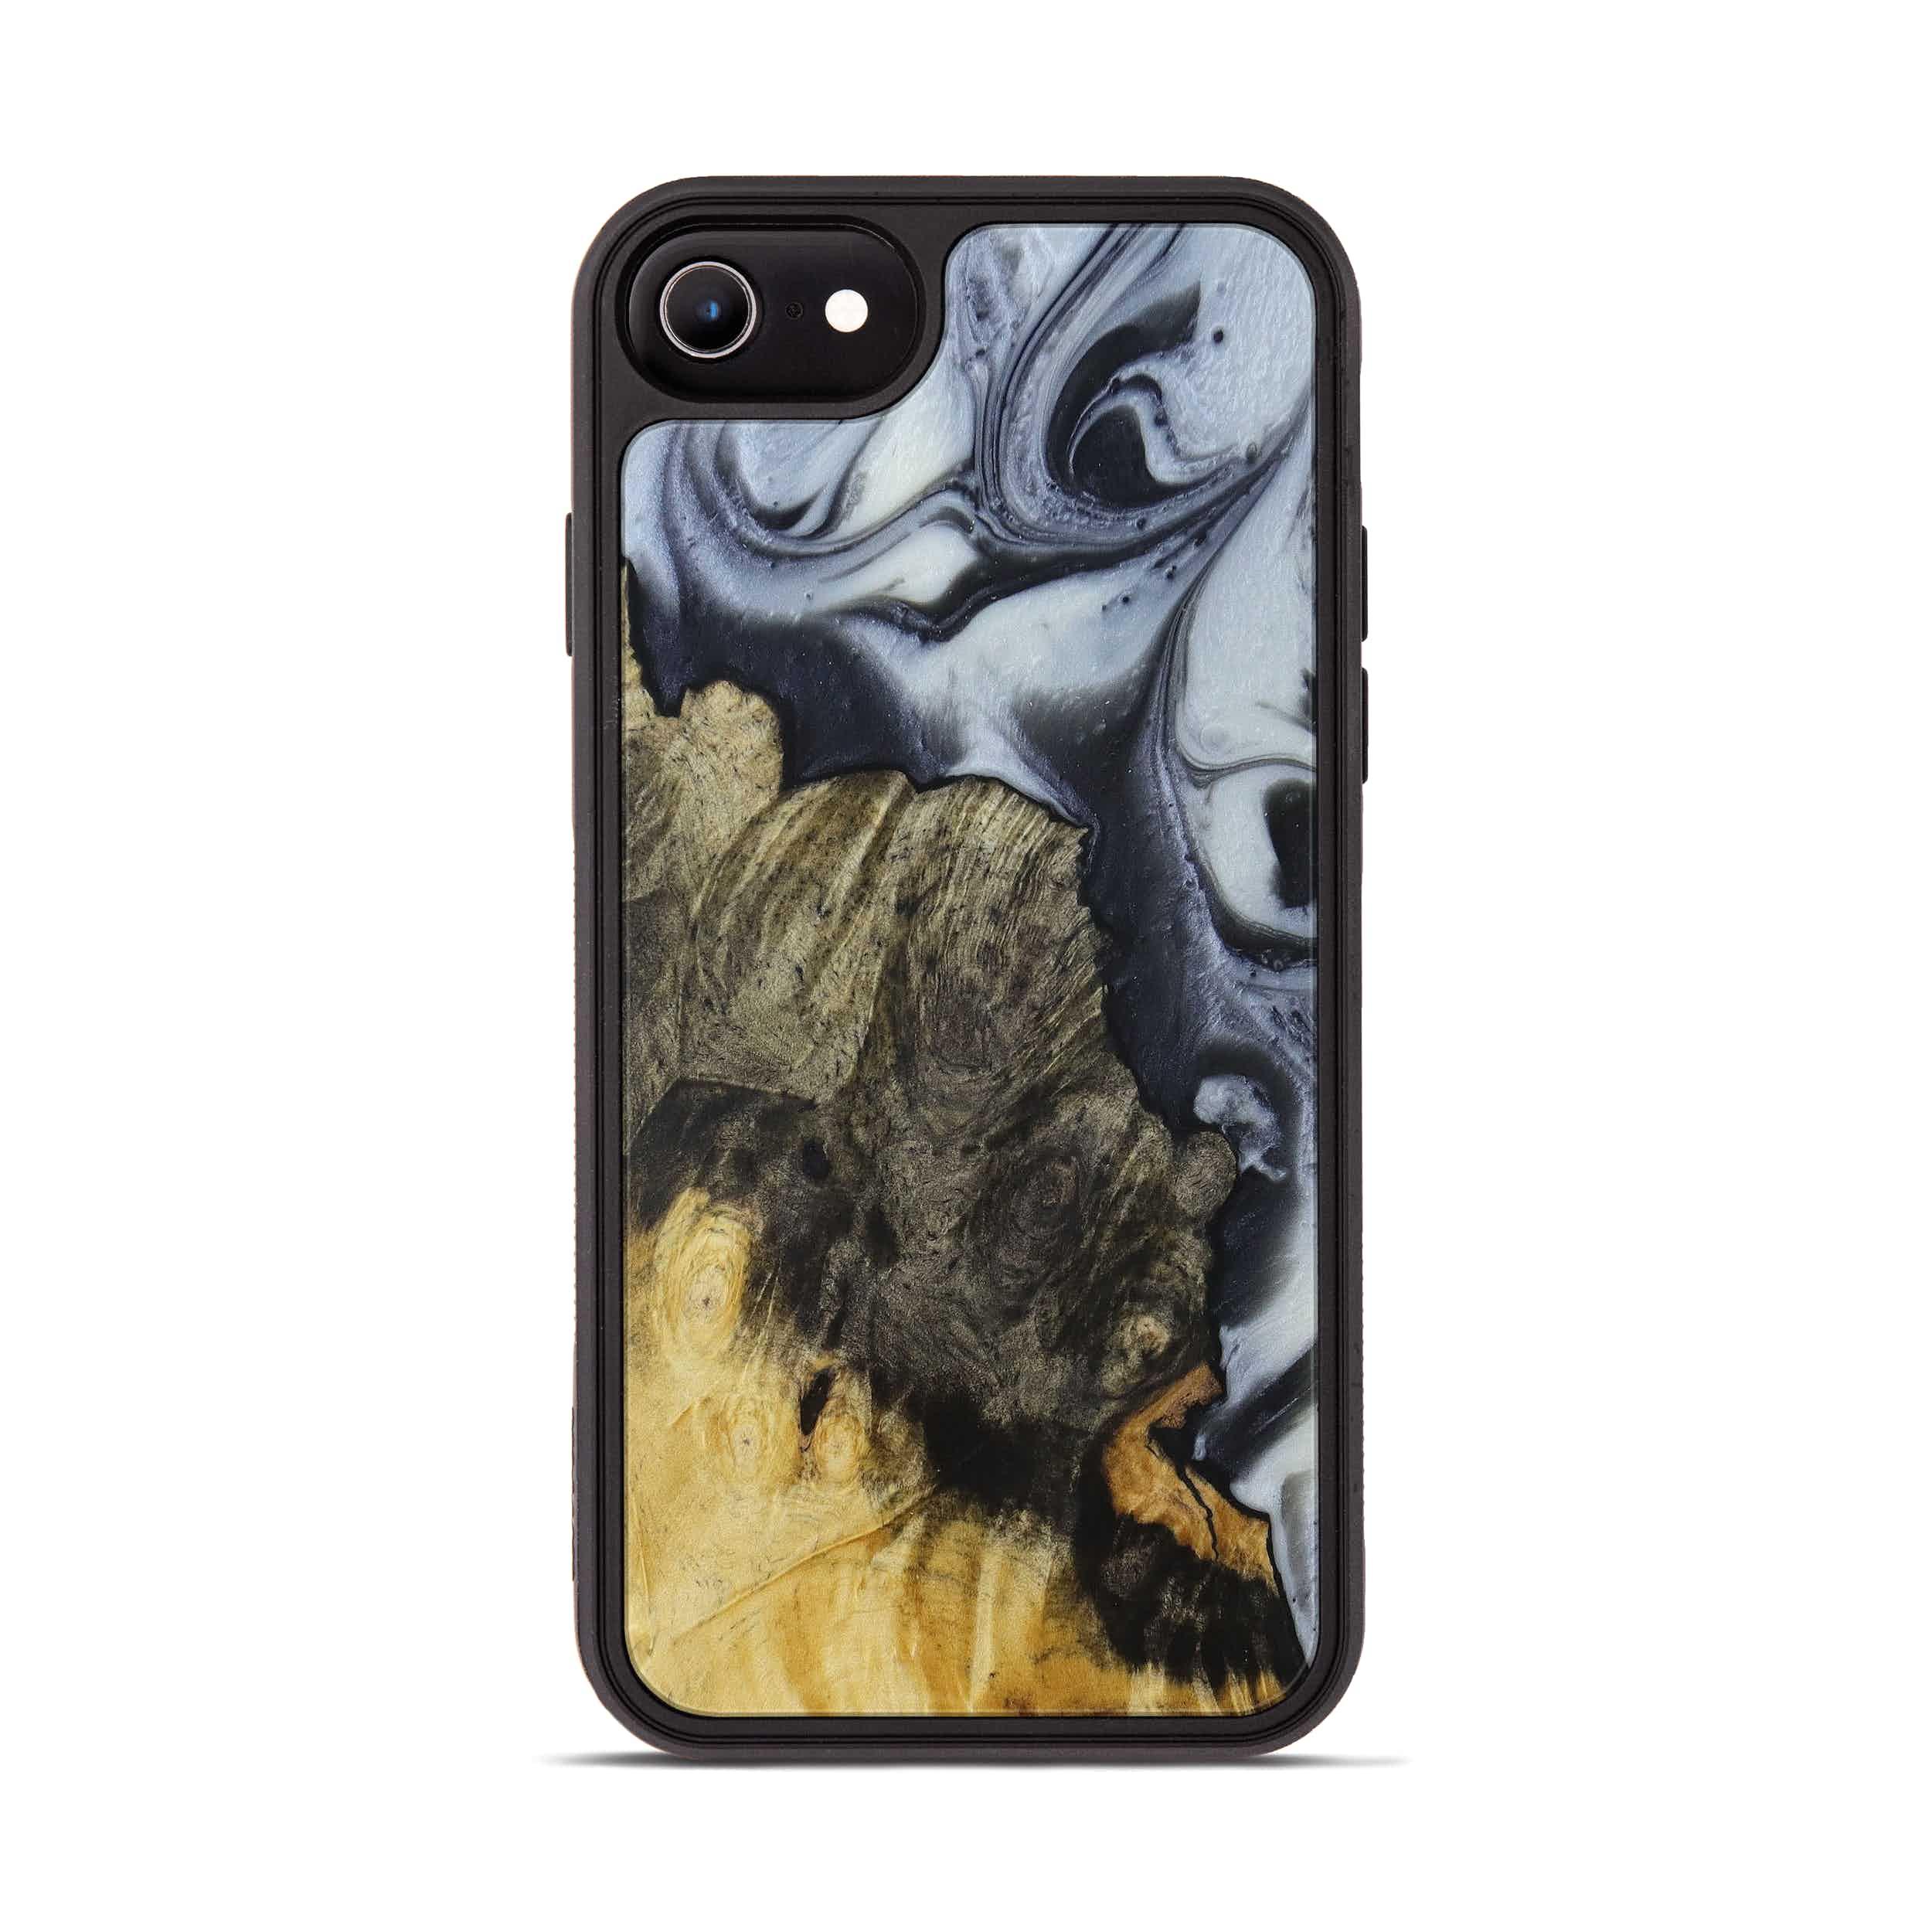 iPhone 6s Wood+Resin Phone Case - Marisa (Black & White, 397918)